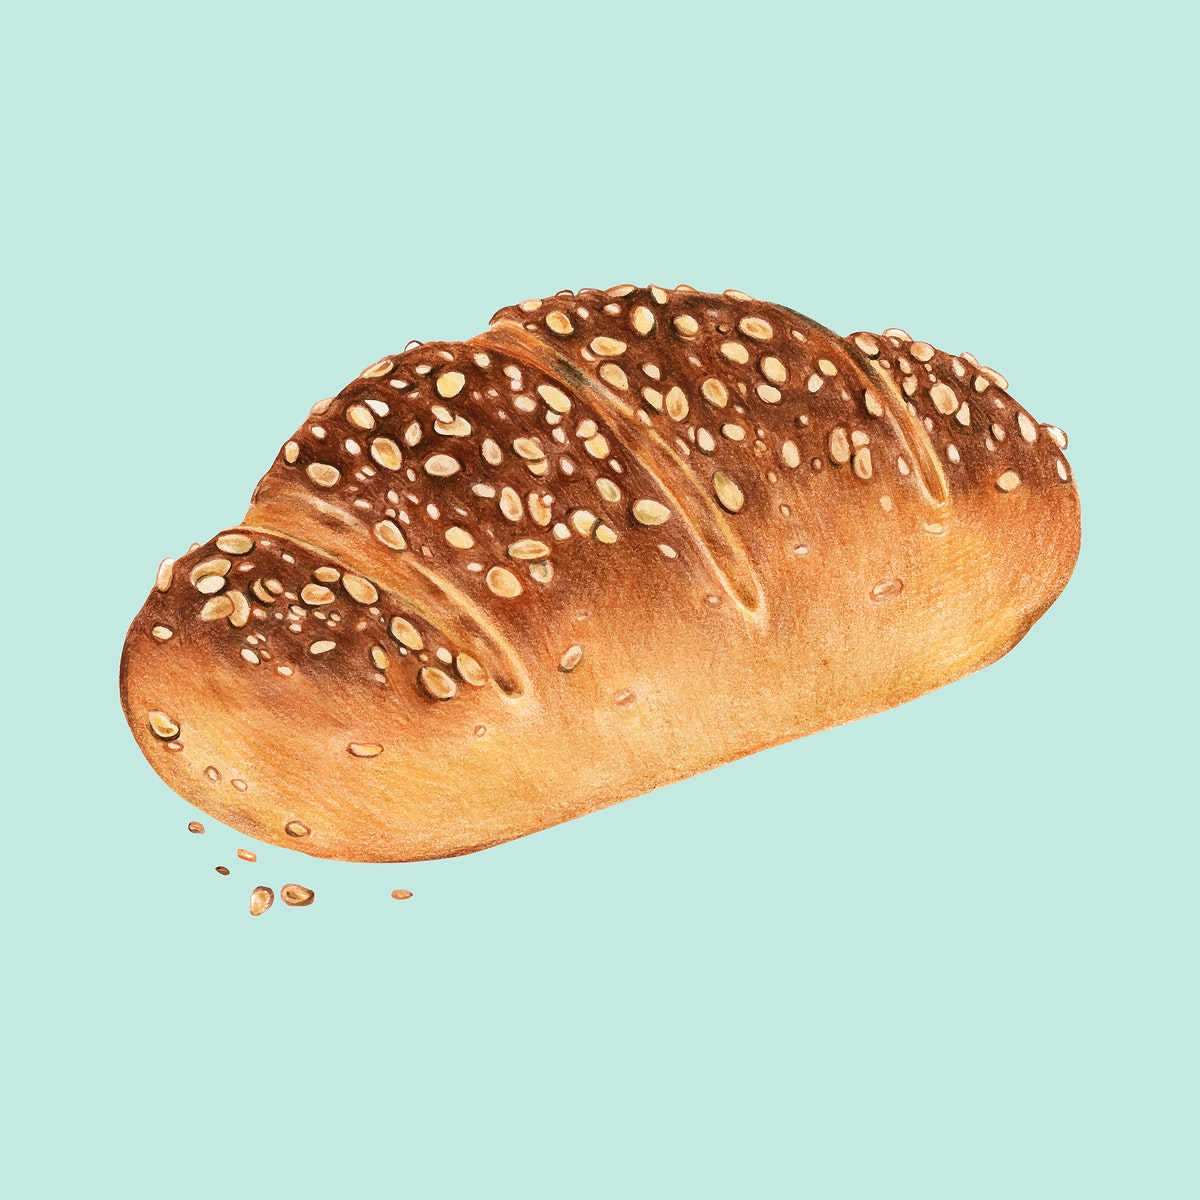 Freshly baked multigrain bread hand-drawn illustration